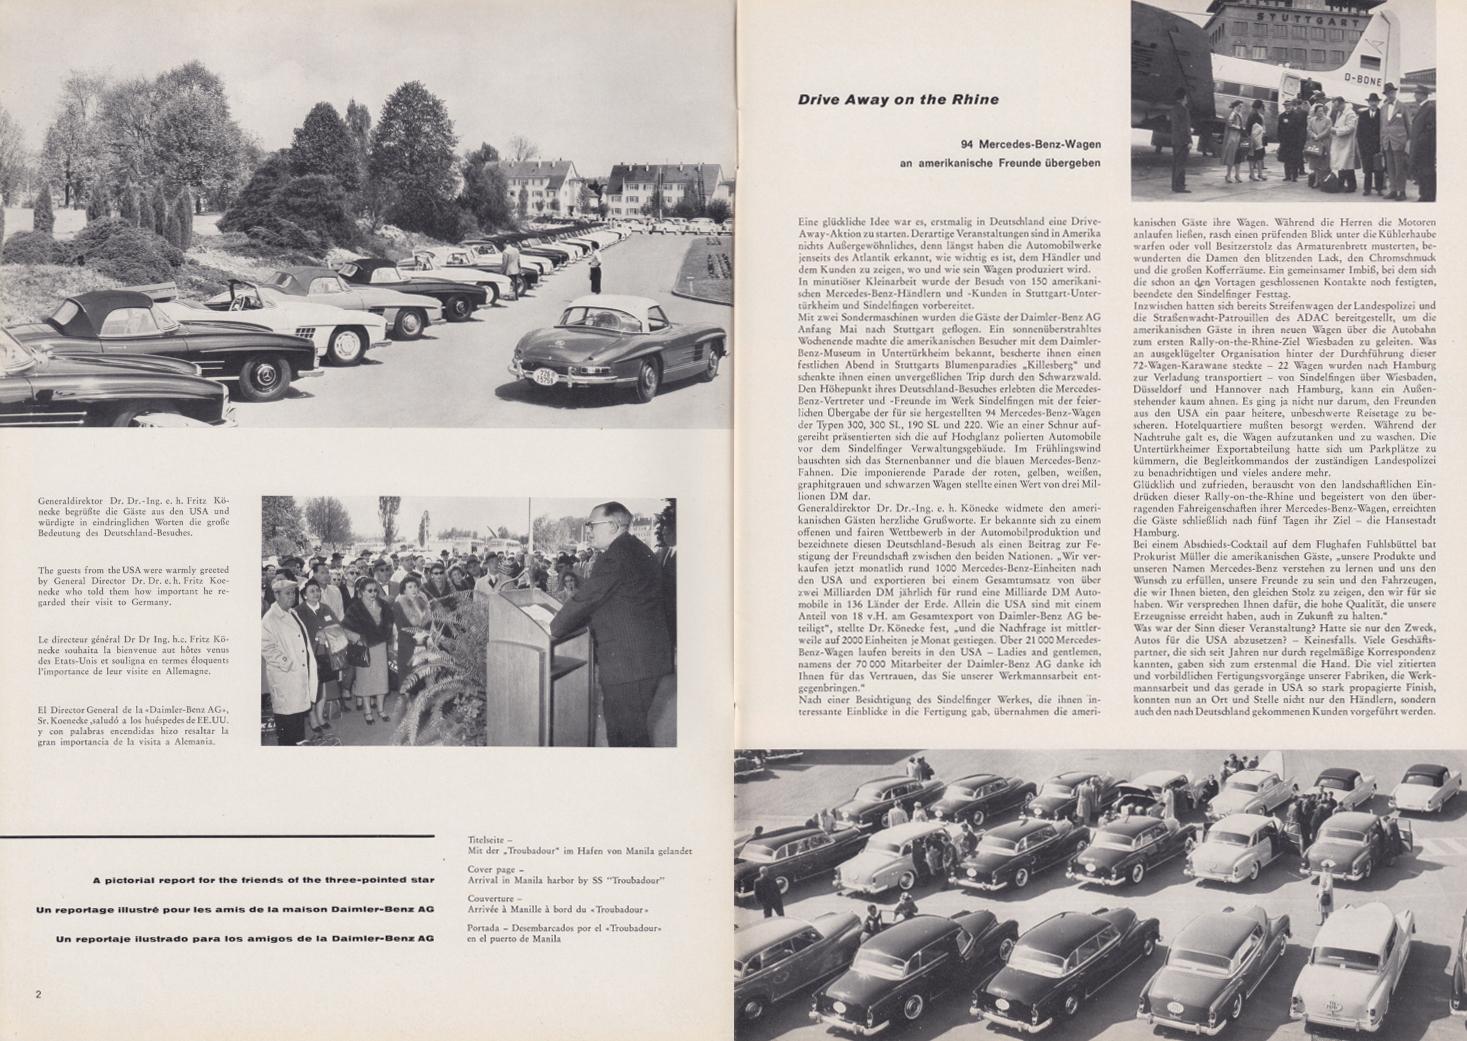 (REVISTA): Periódico In aller welt n.º 33 - Mercedes-Benz no mundo - 1959 - multilingue 002